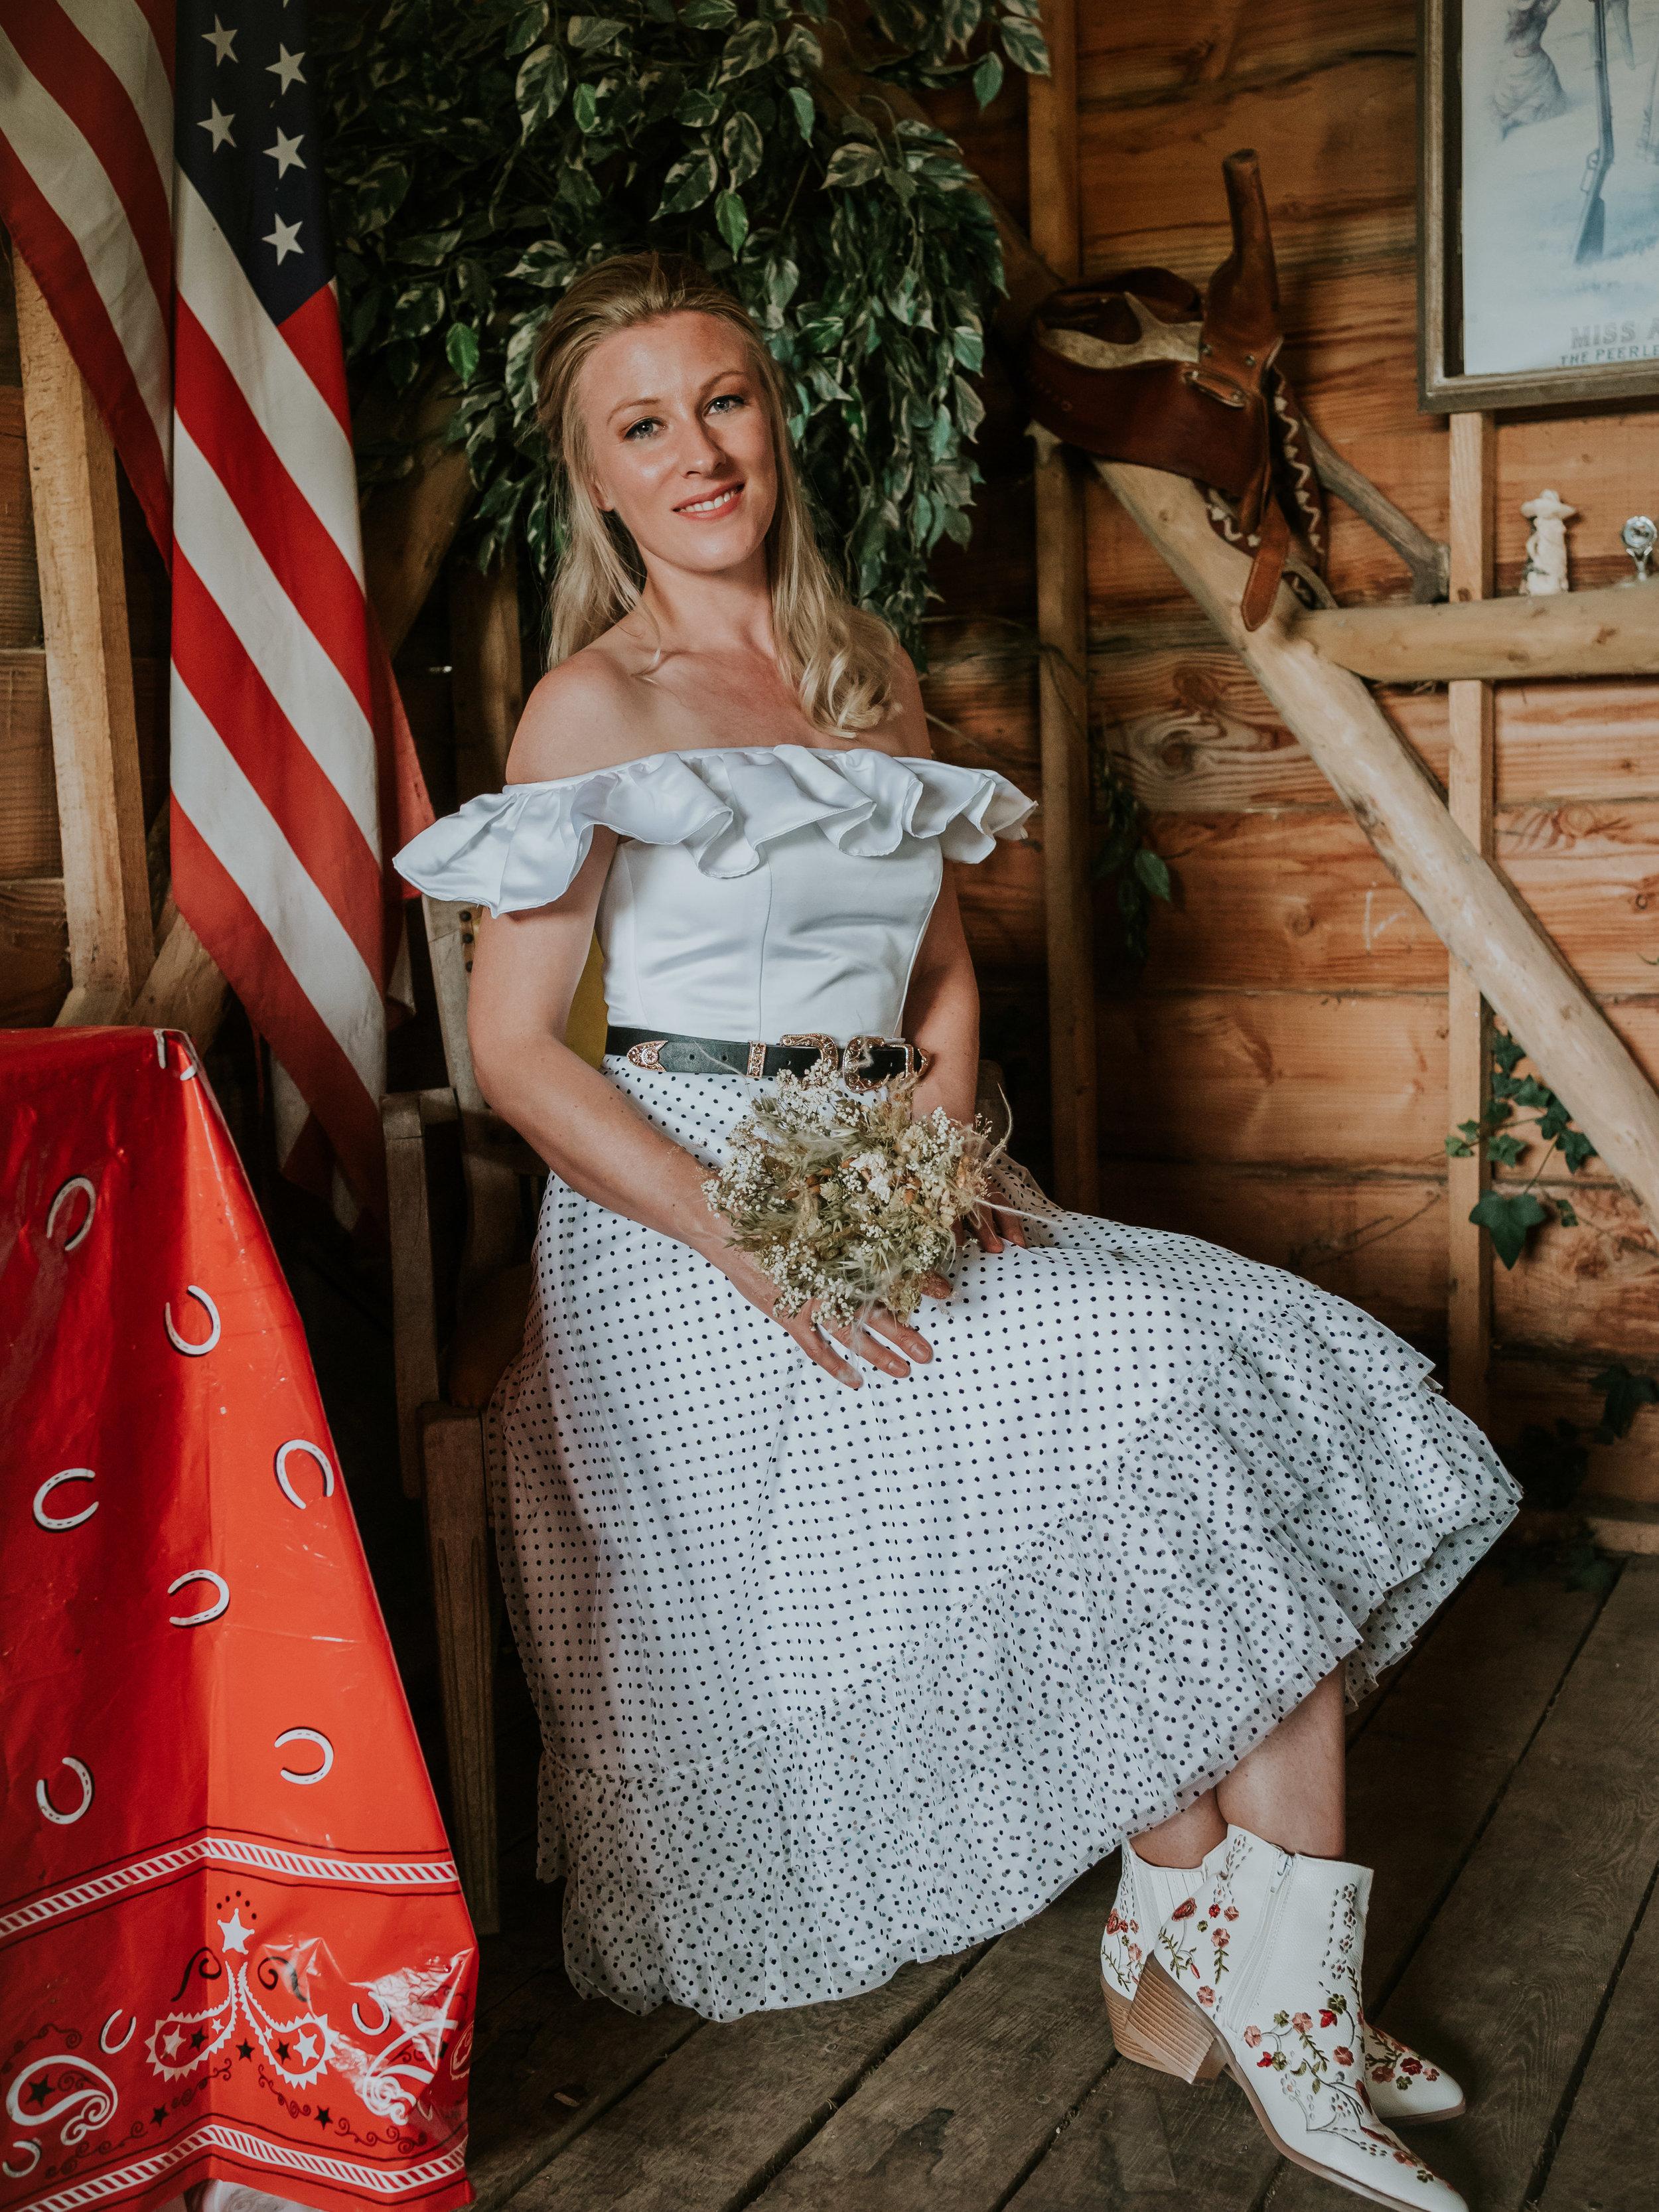 Jessica-Milberg-Photography-Brighton-London-Wedding-Fashion-Photographer-Creative-Wedding-Dress-108.jpg